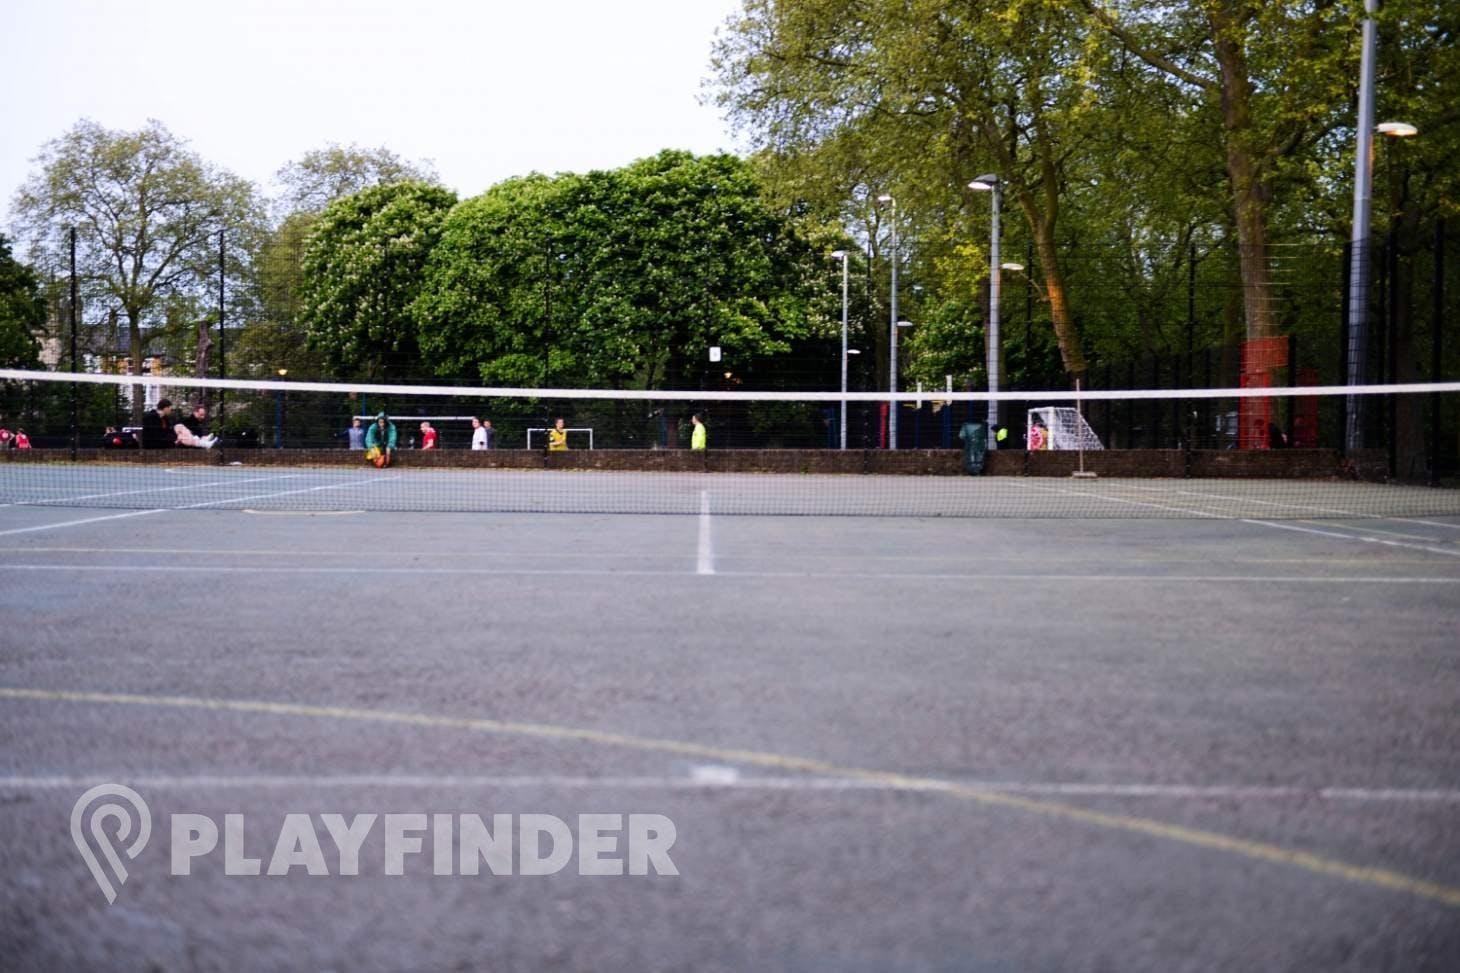 Highbury Fields Outdoor   Hard (macadam) tennis court